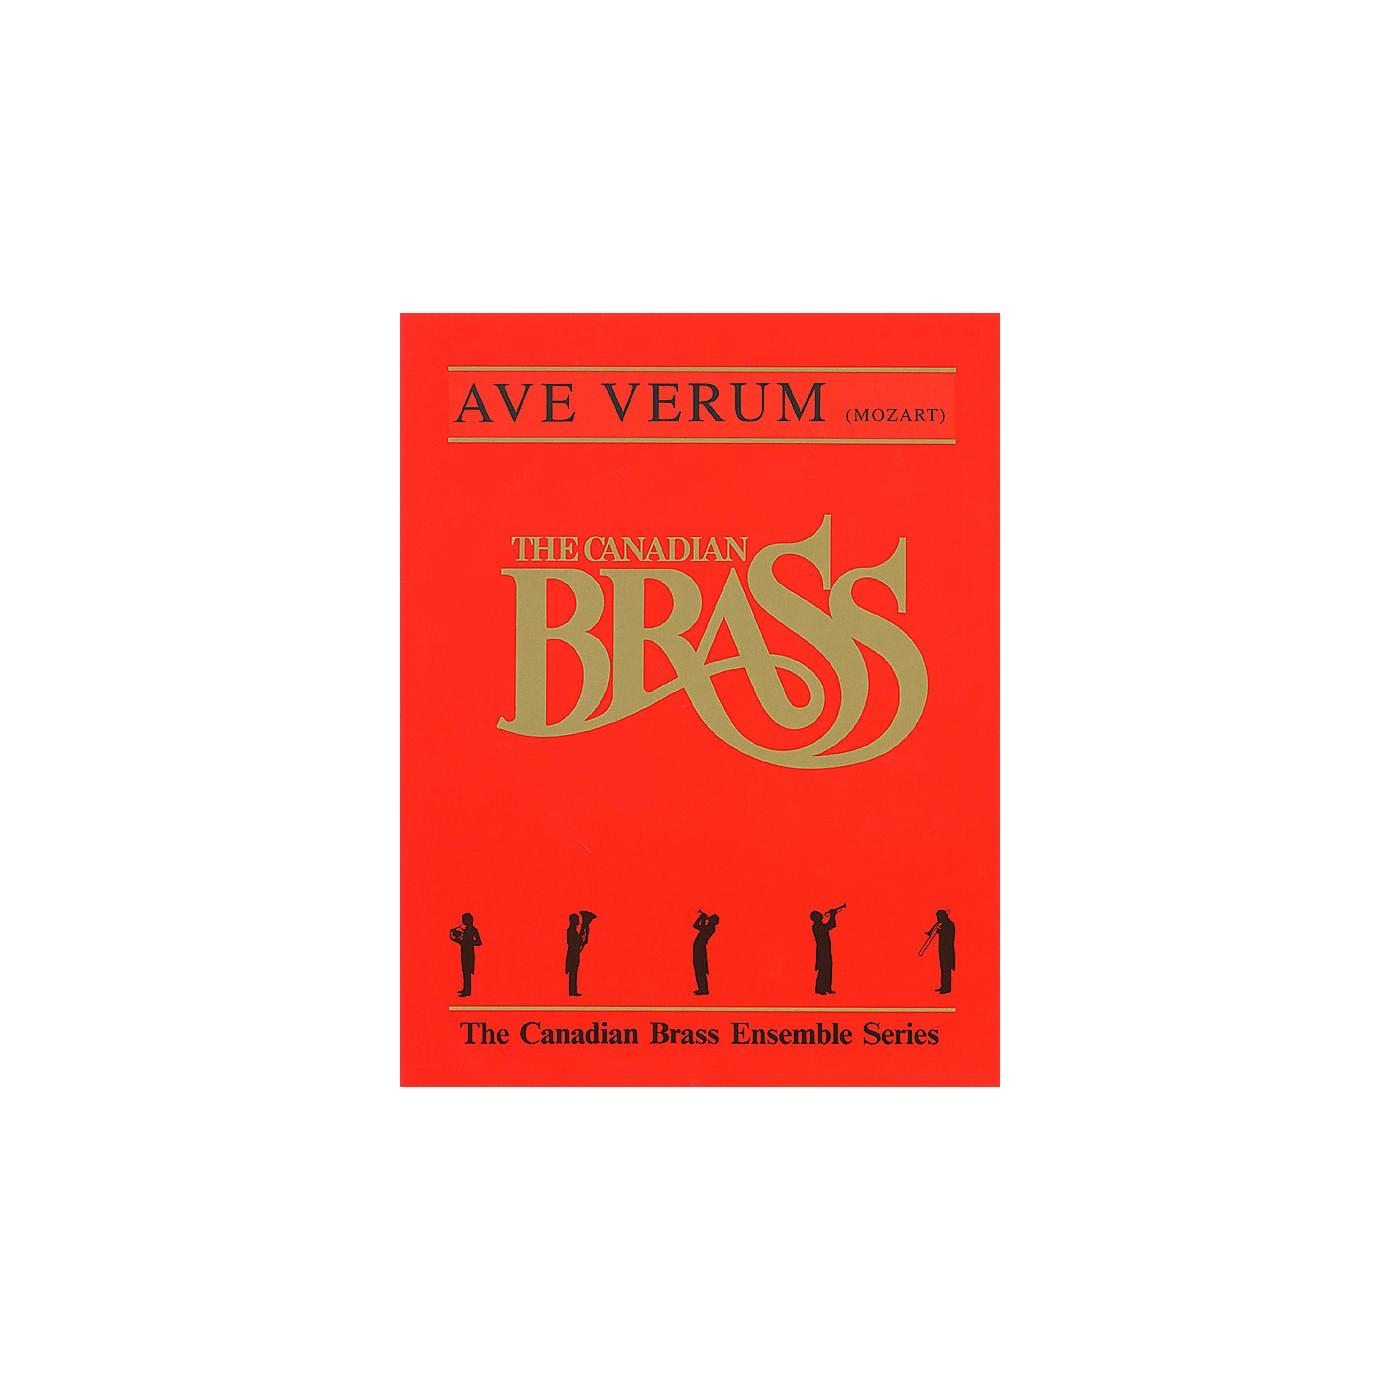 Hal Leonard Ave Verum (Score and Parts) Brass Ensemble Series by Wolfgang Amadeus Mozart thumbnail